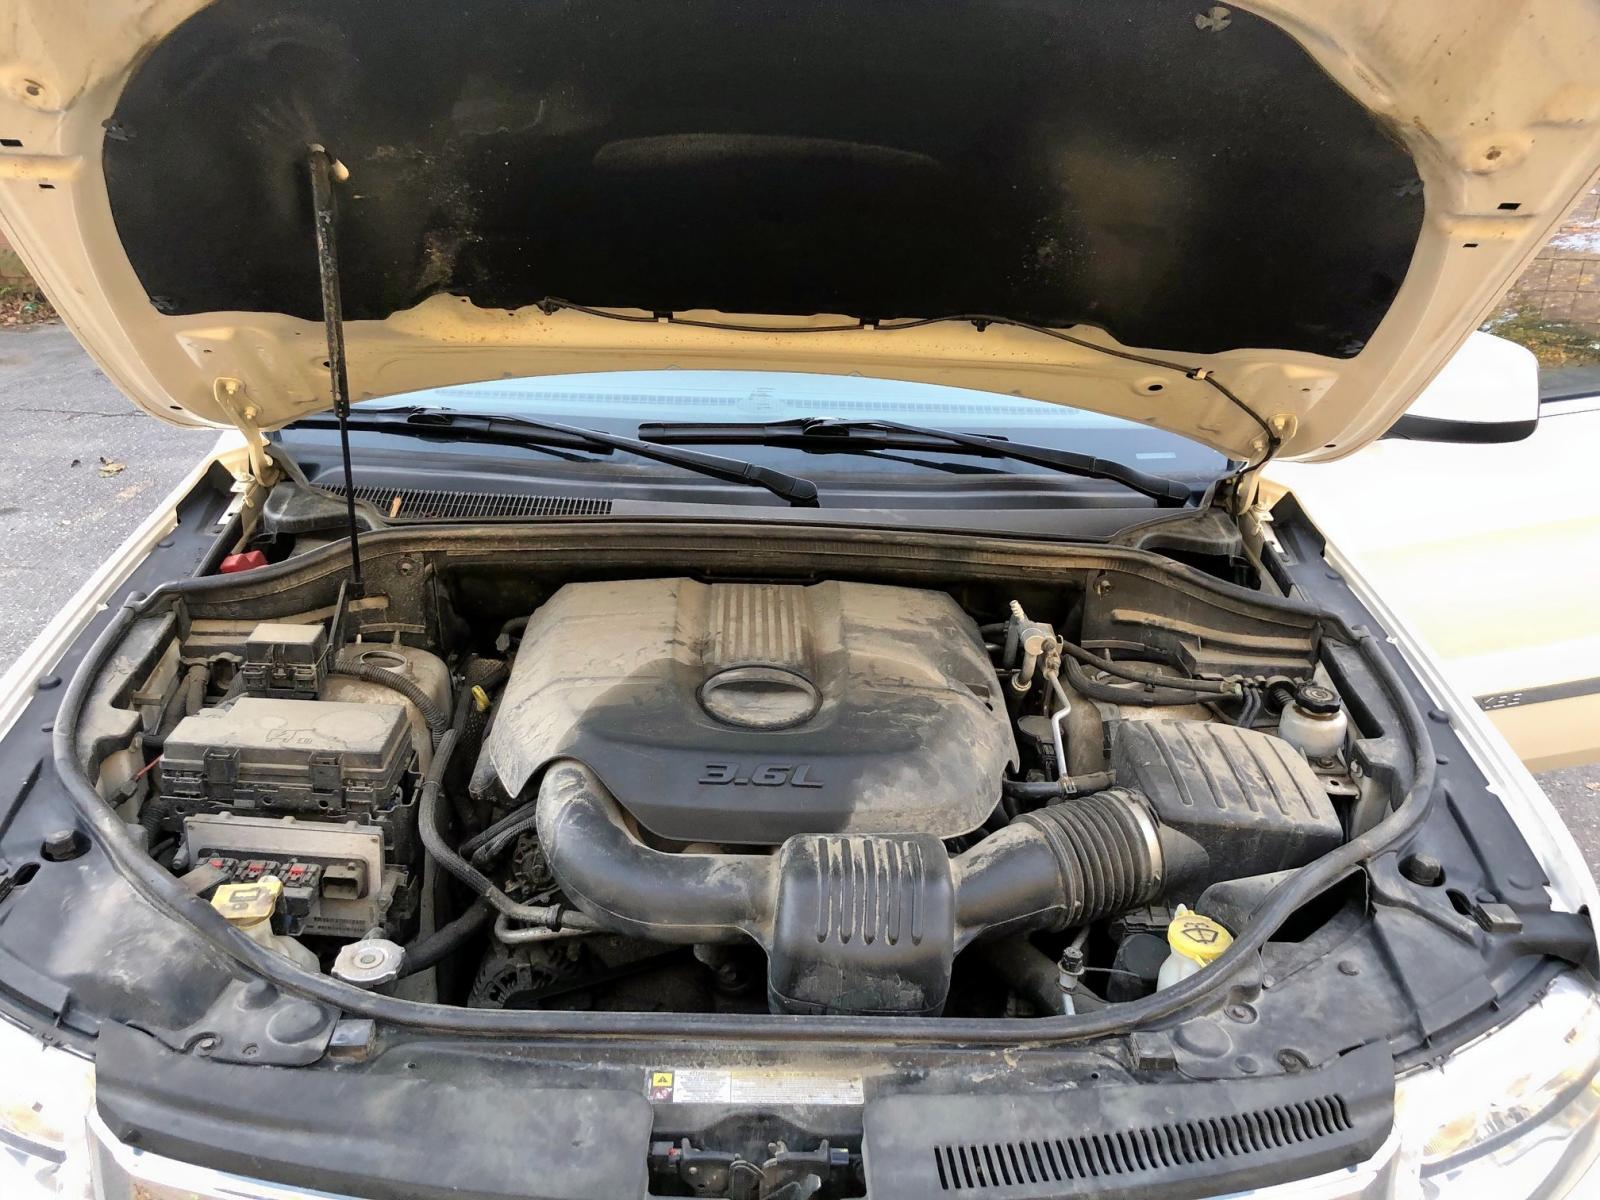 1J4RR4GGXBC525697 - 2011 Jeep Grand Cher 3.6L engine view